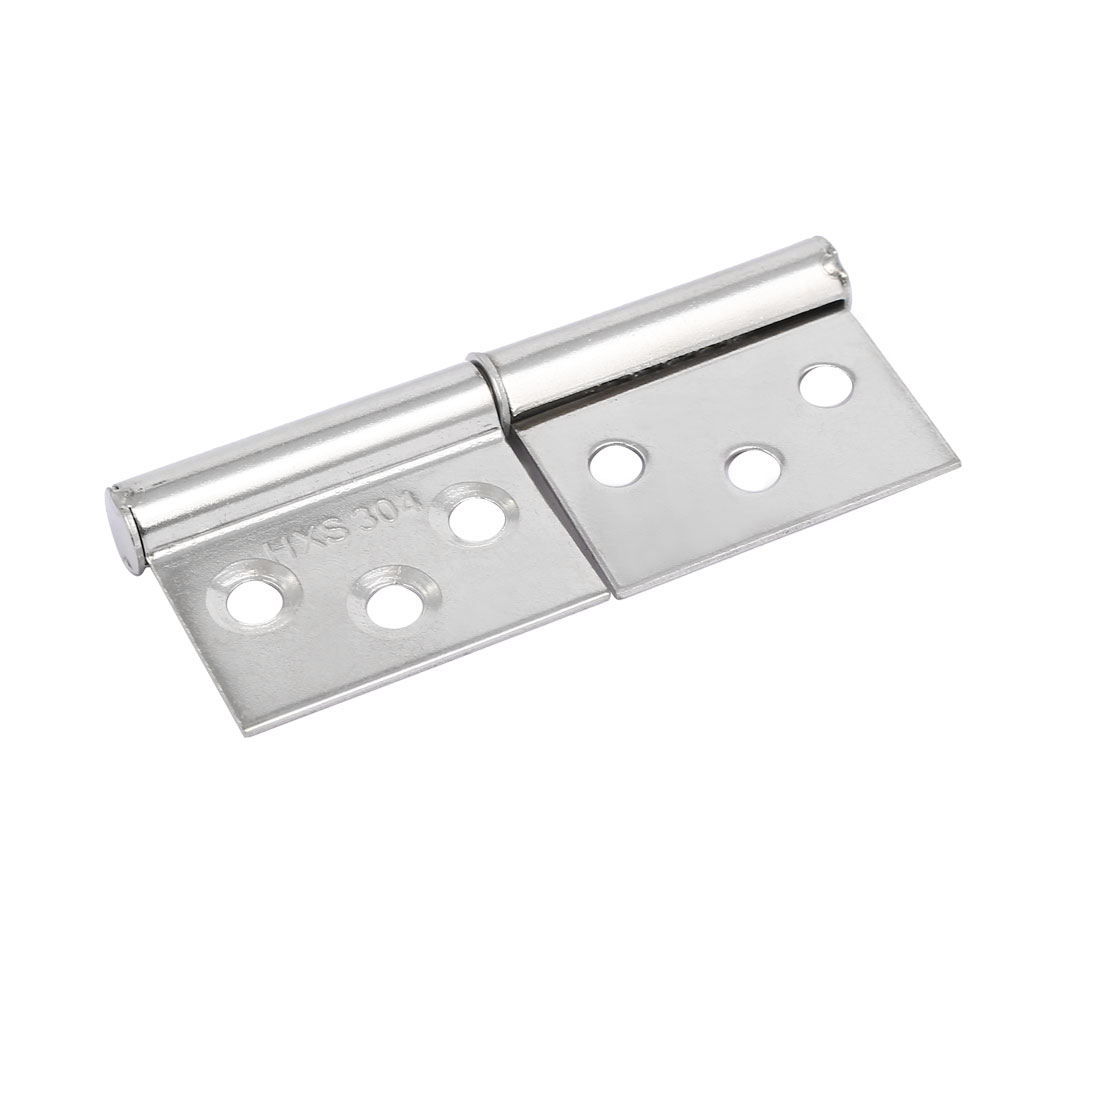 62mmx24mm 6 Holes 360 Degree Rotatable Door Pivot Hinges Silver Tone 2pcs